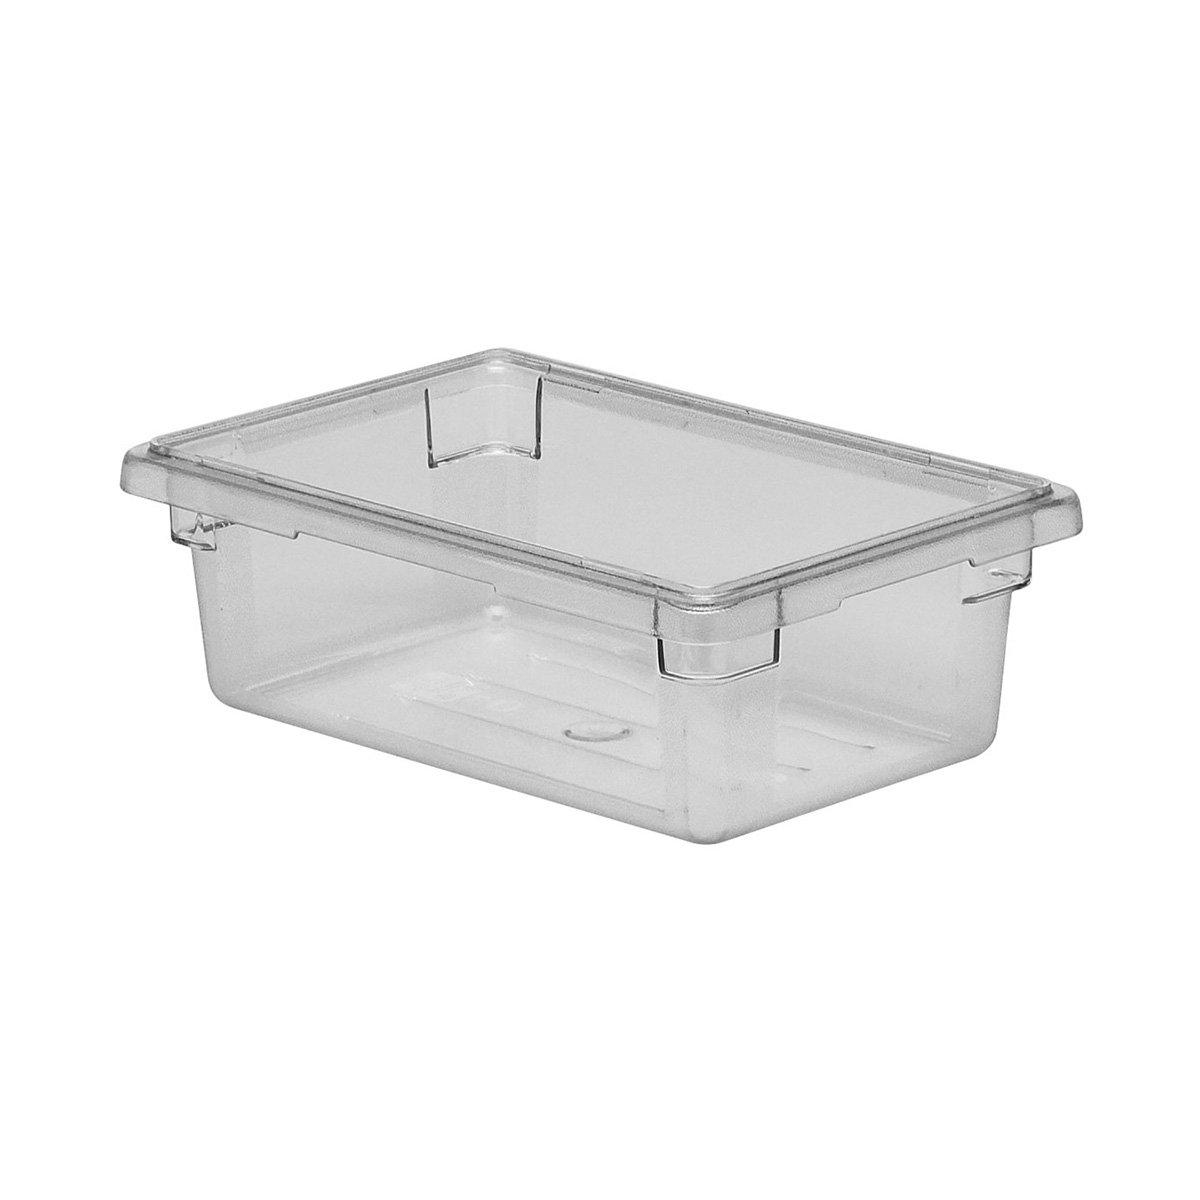 Cambro 12186CW135 Clear Food Box 12'' x 18'' x 6'' Camwear, 6 Pack